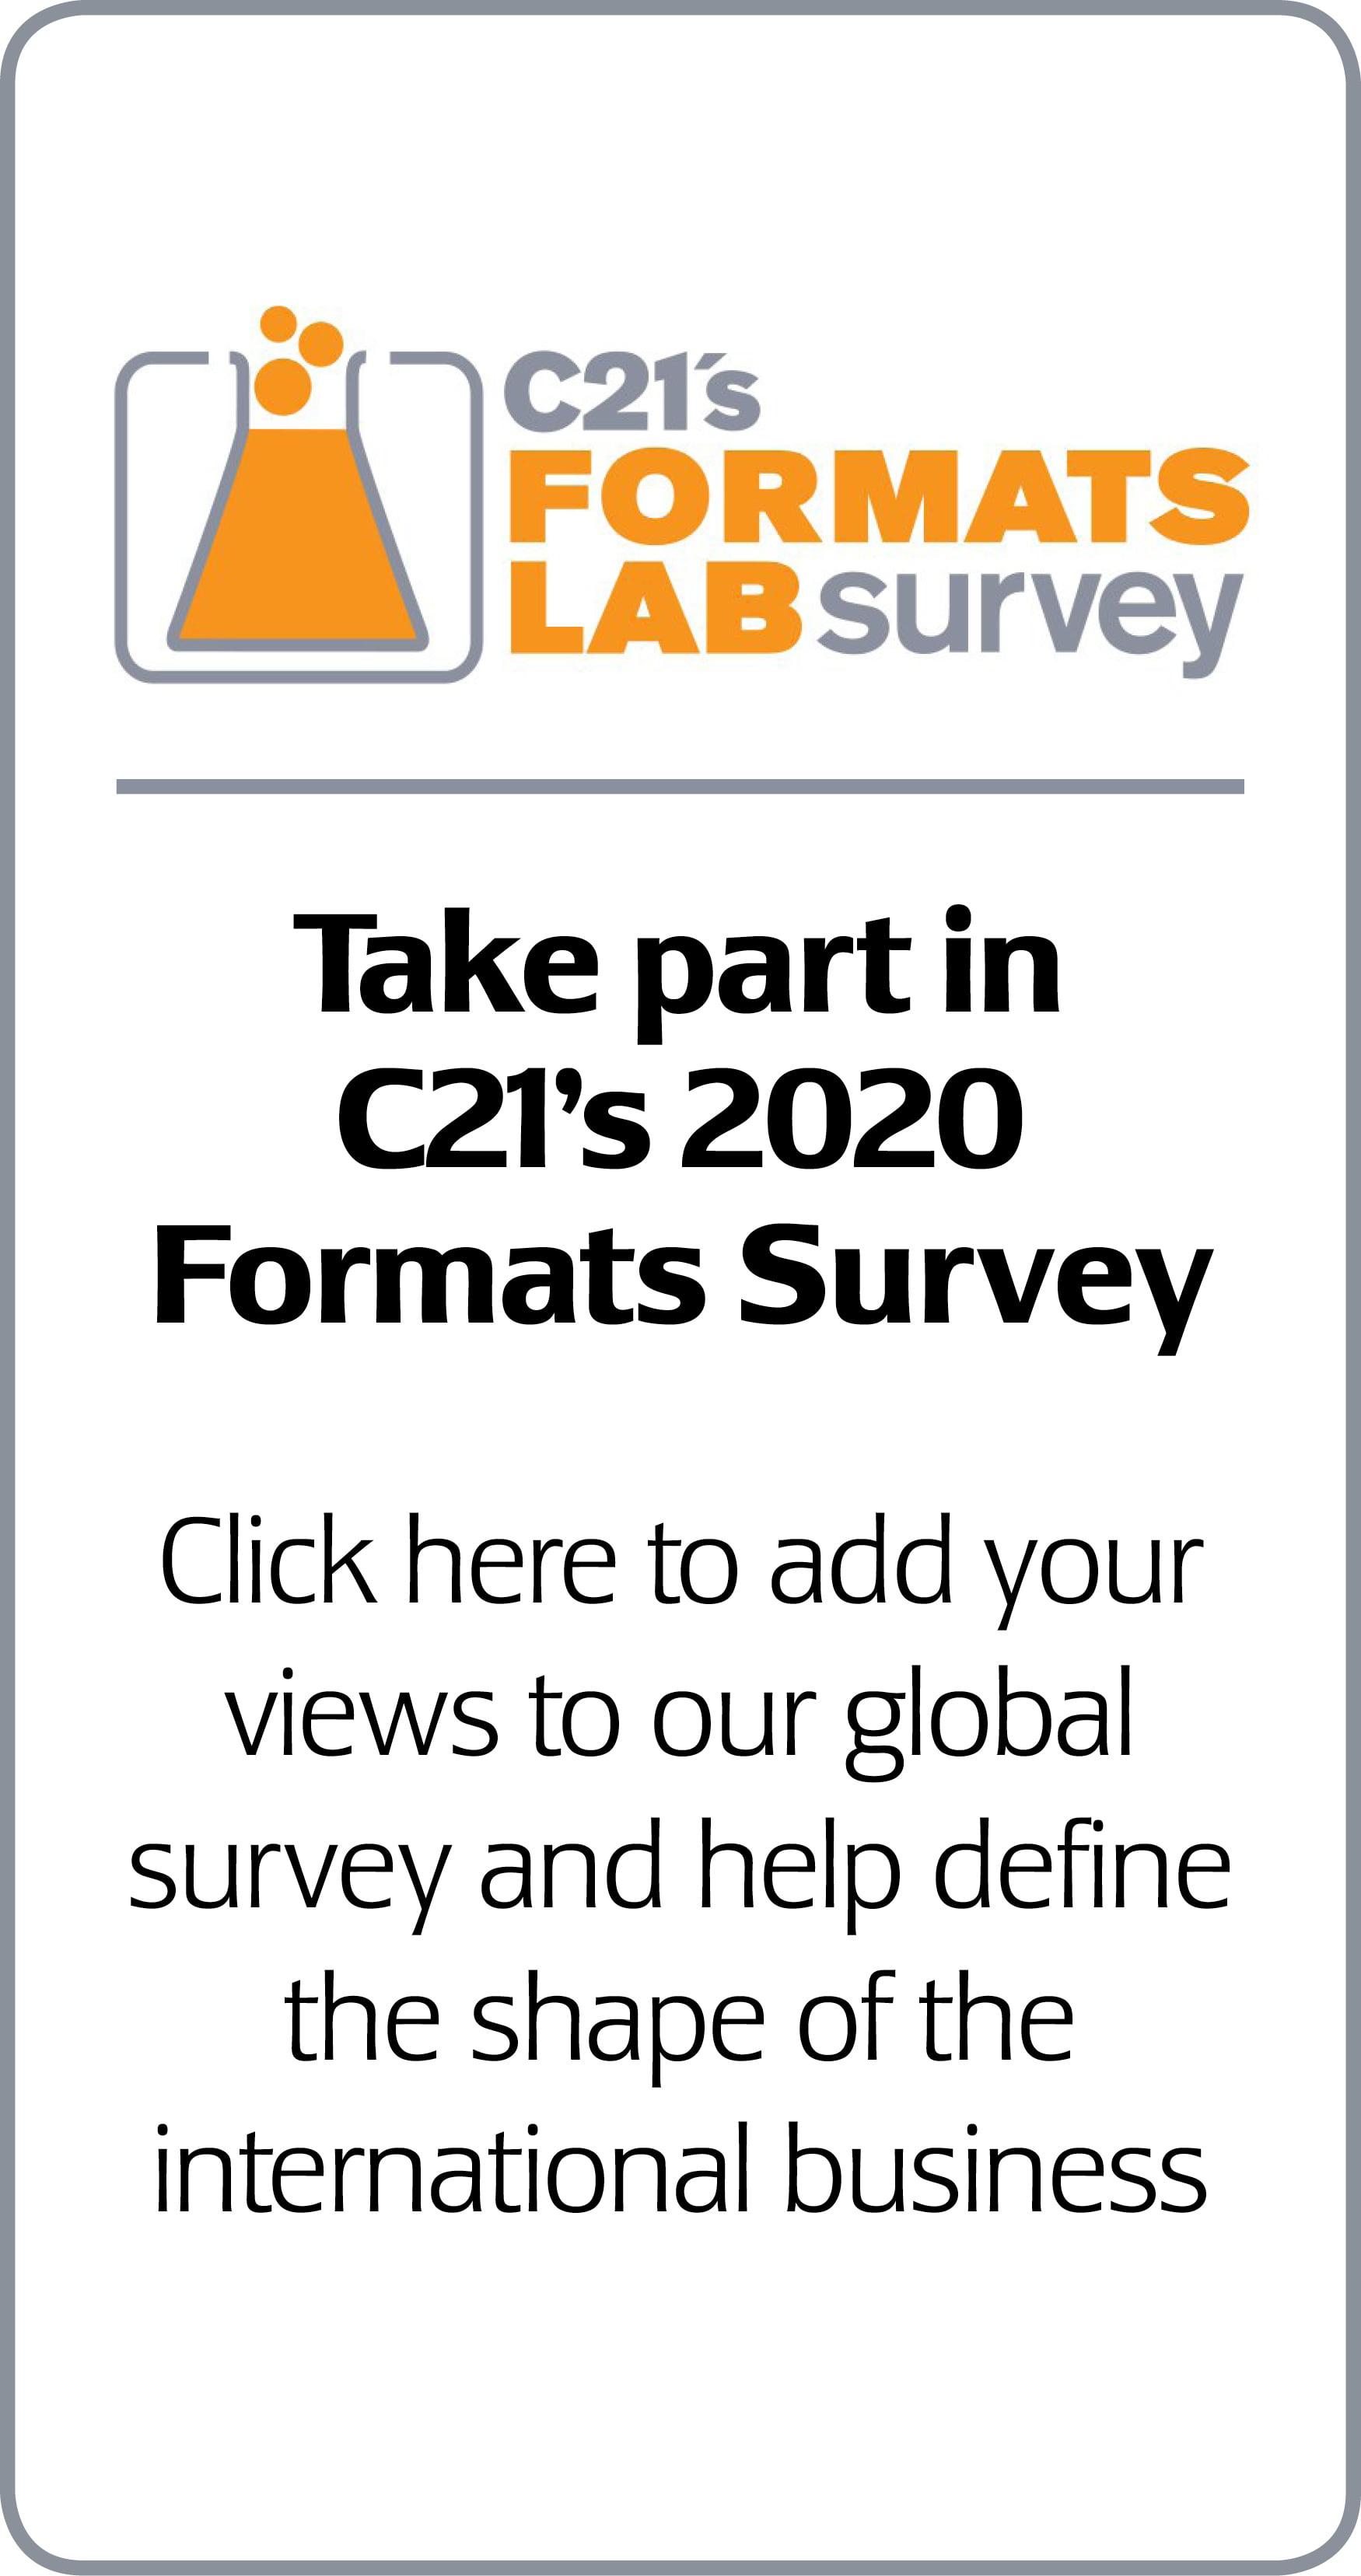 Formats survey